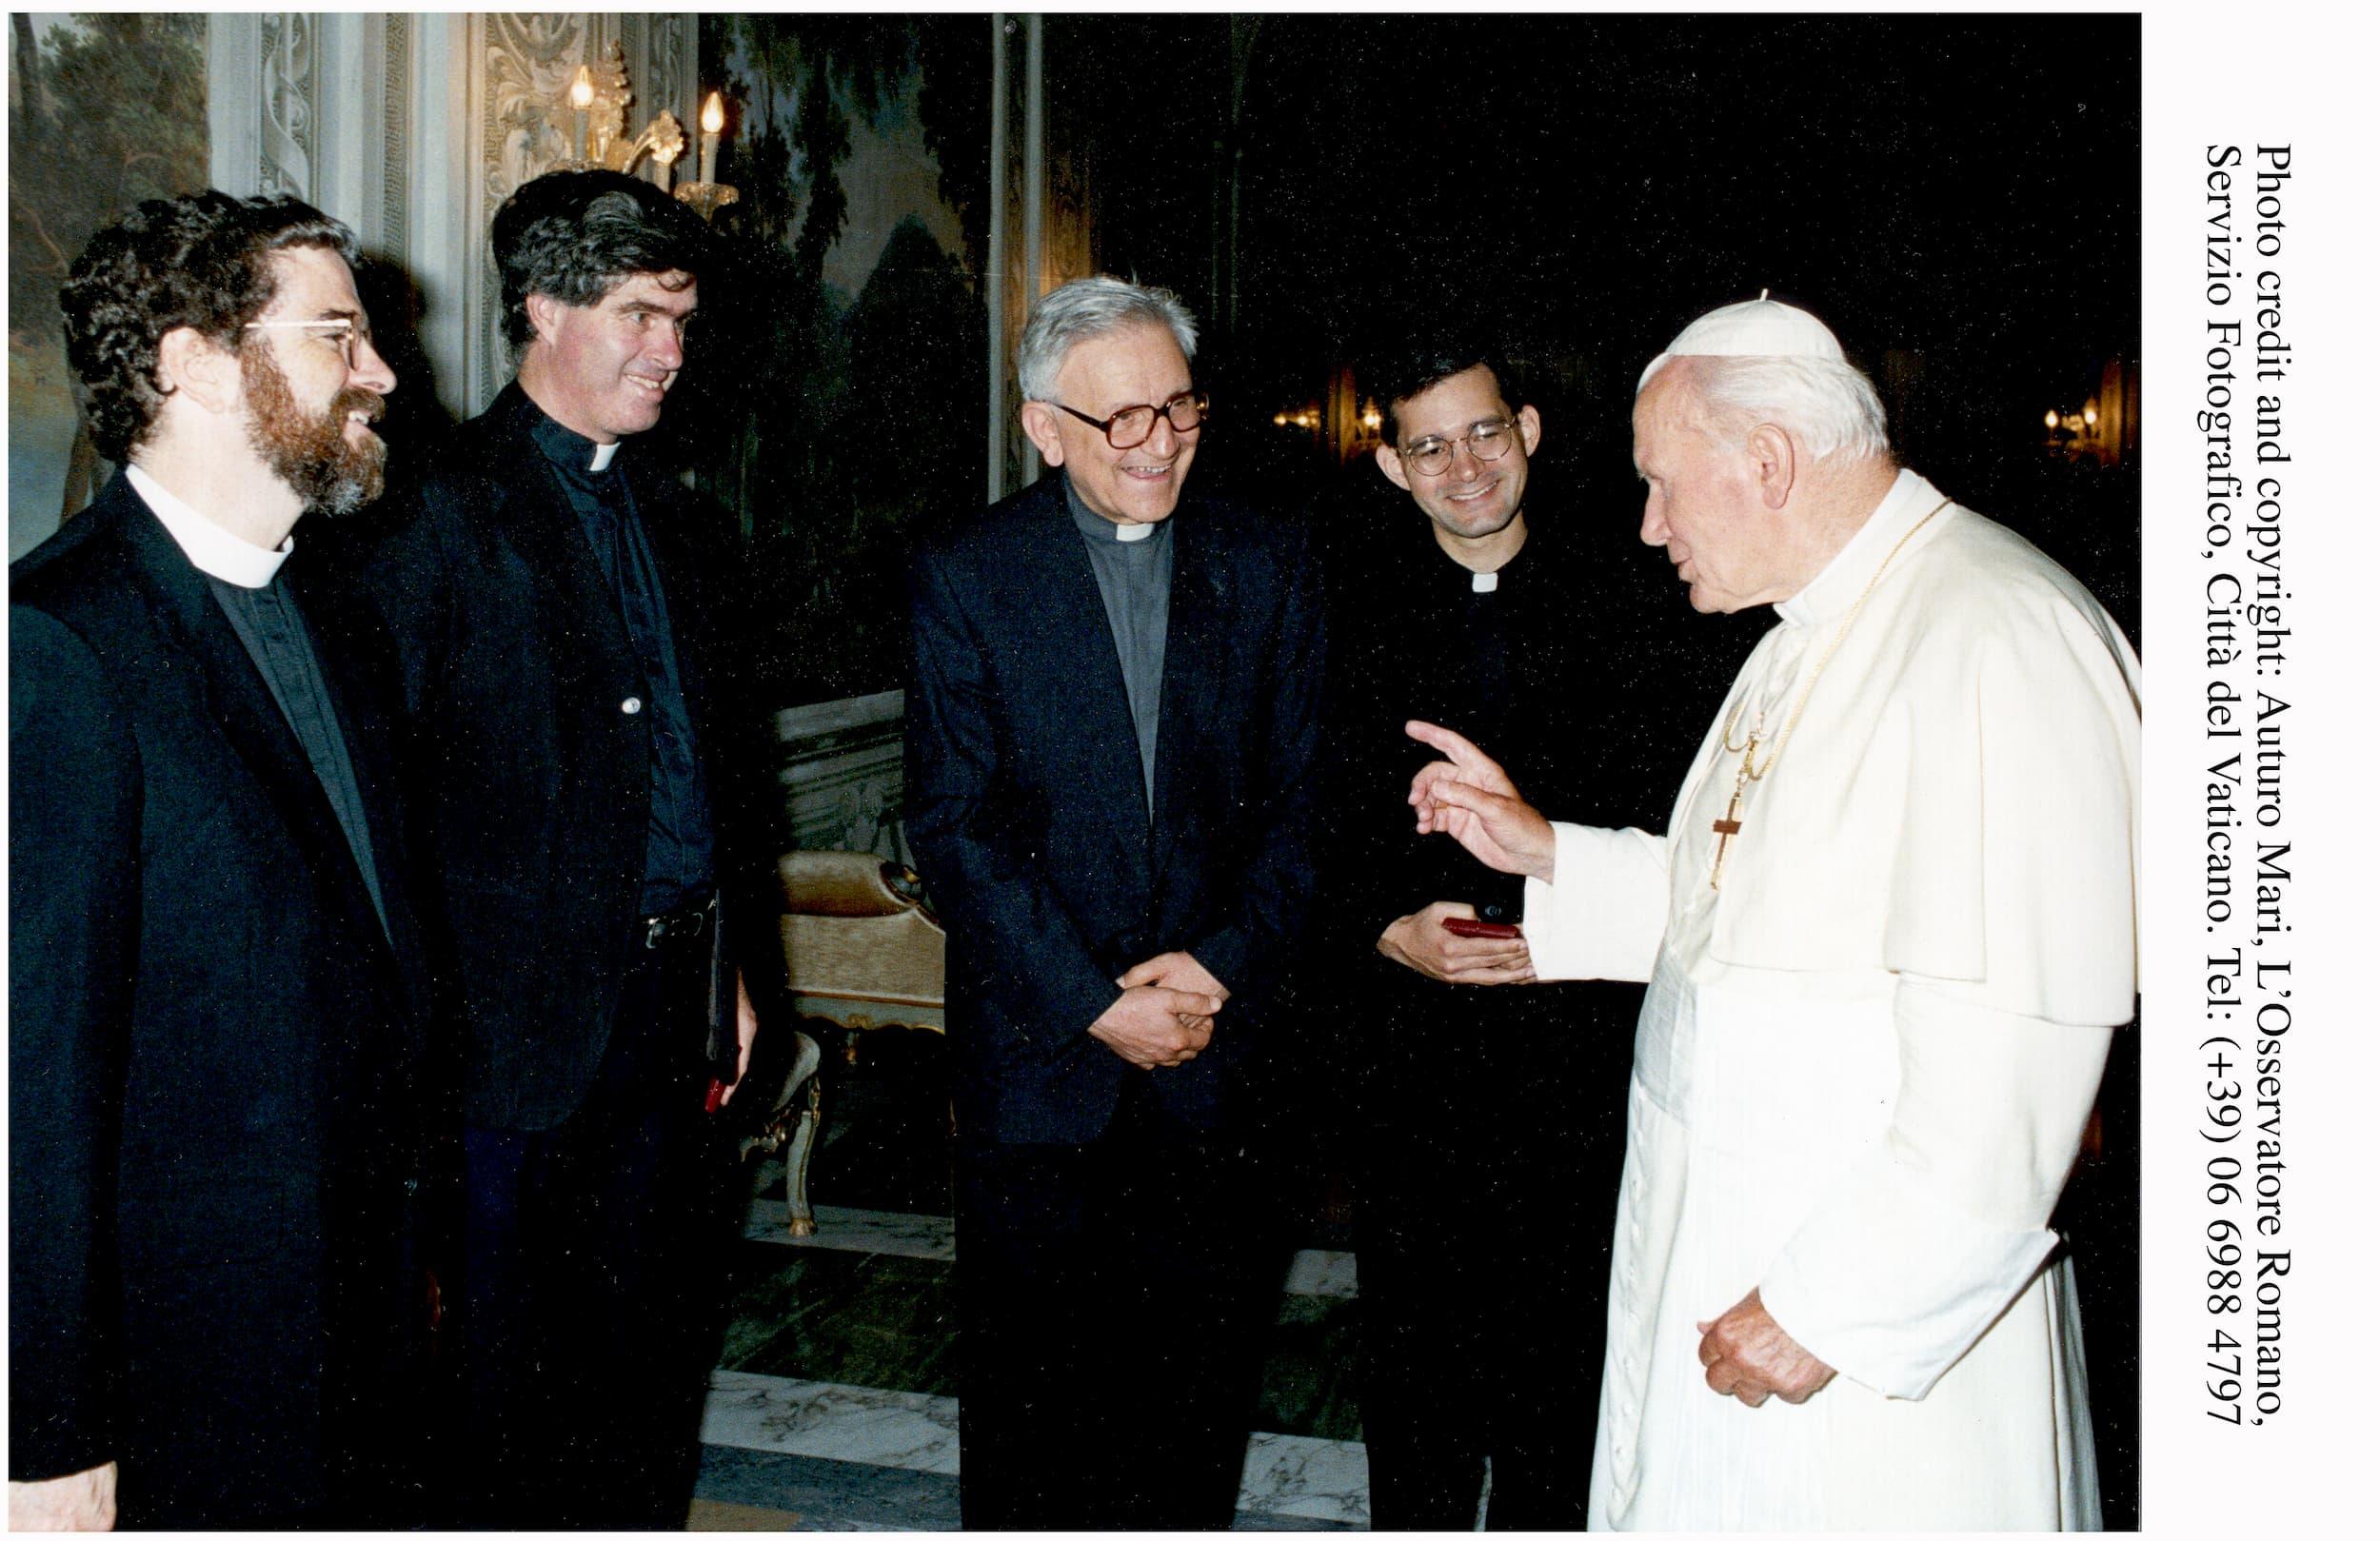 Pope John Paul II with Vatican Observatory Team